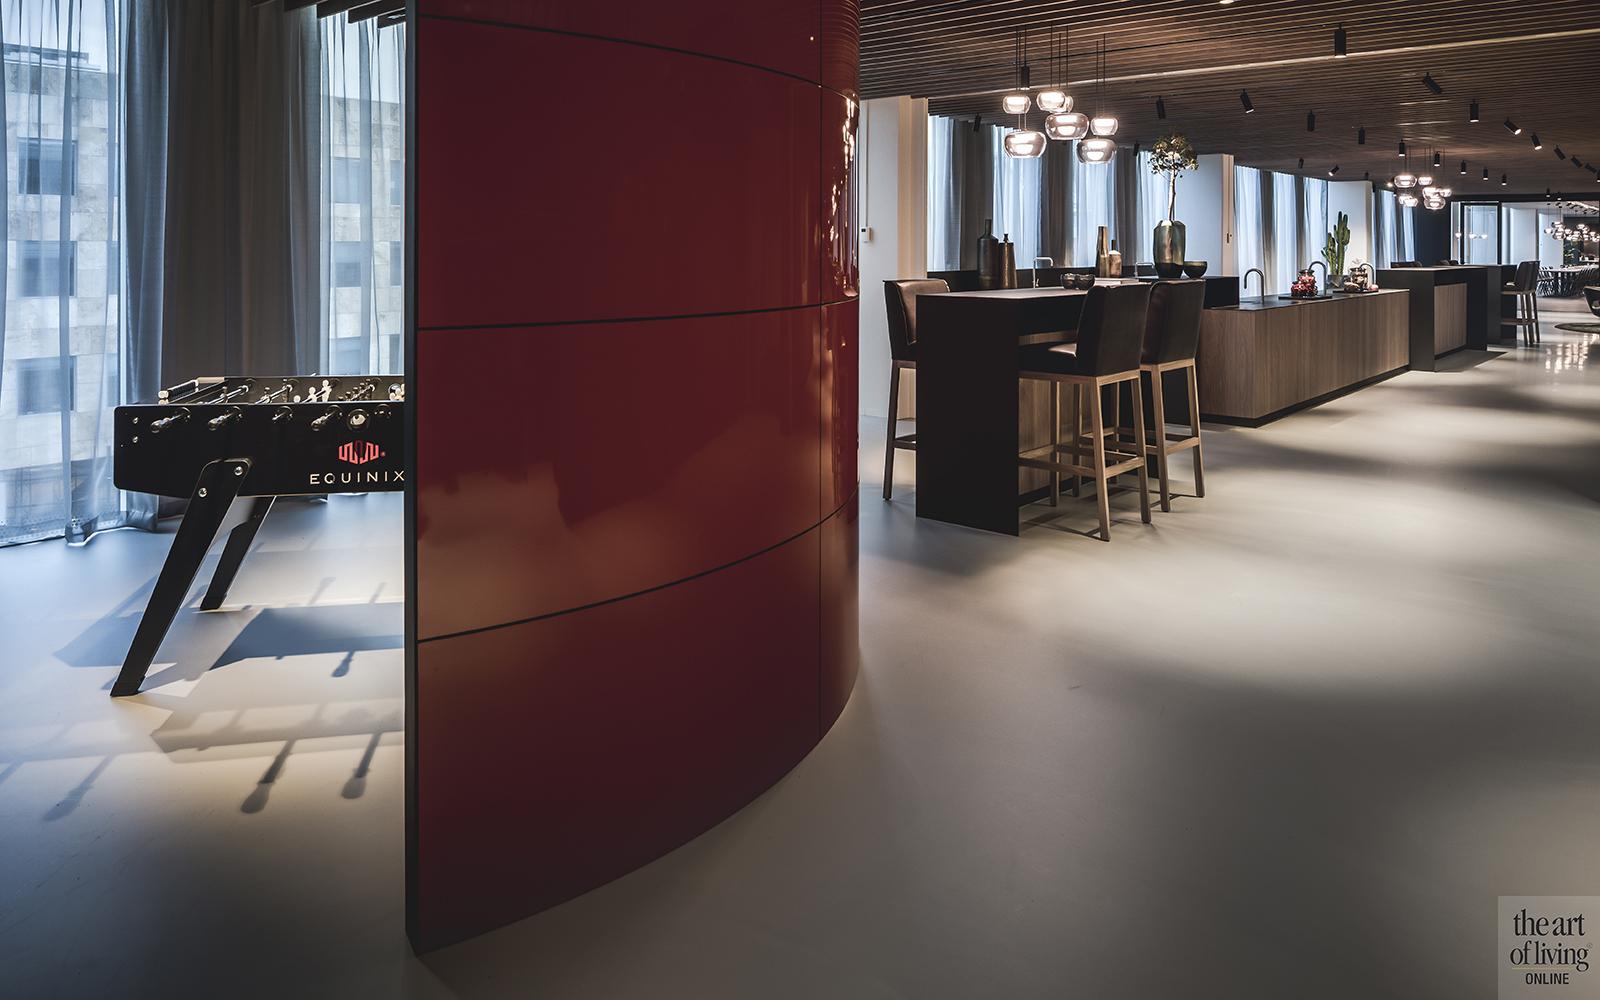 Kantoor inspiratie,, Kabaz Architecten, Kantoor Amsterdam, Amsterdam, Kantoor inrichting, Design, Architectuur, Interieur, Equinix, Voetbaltafel, Ontspannen, Bar, Koffiebar, Coffeecorner